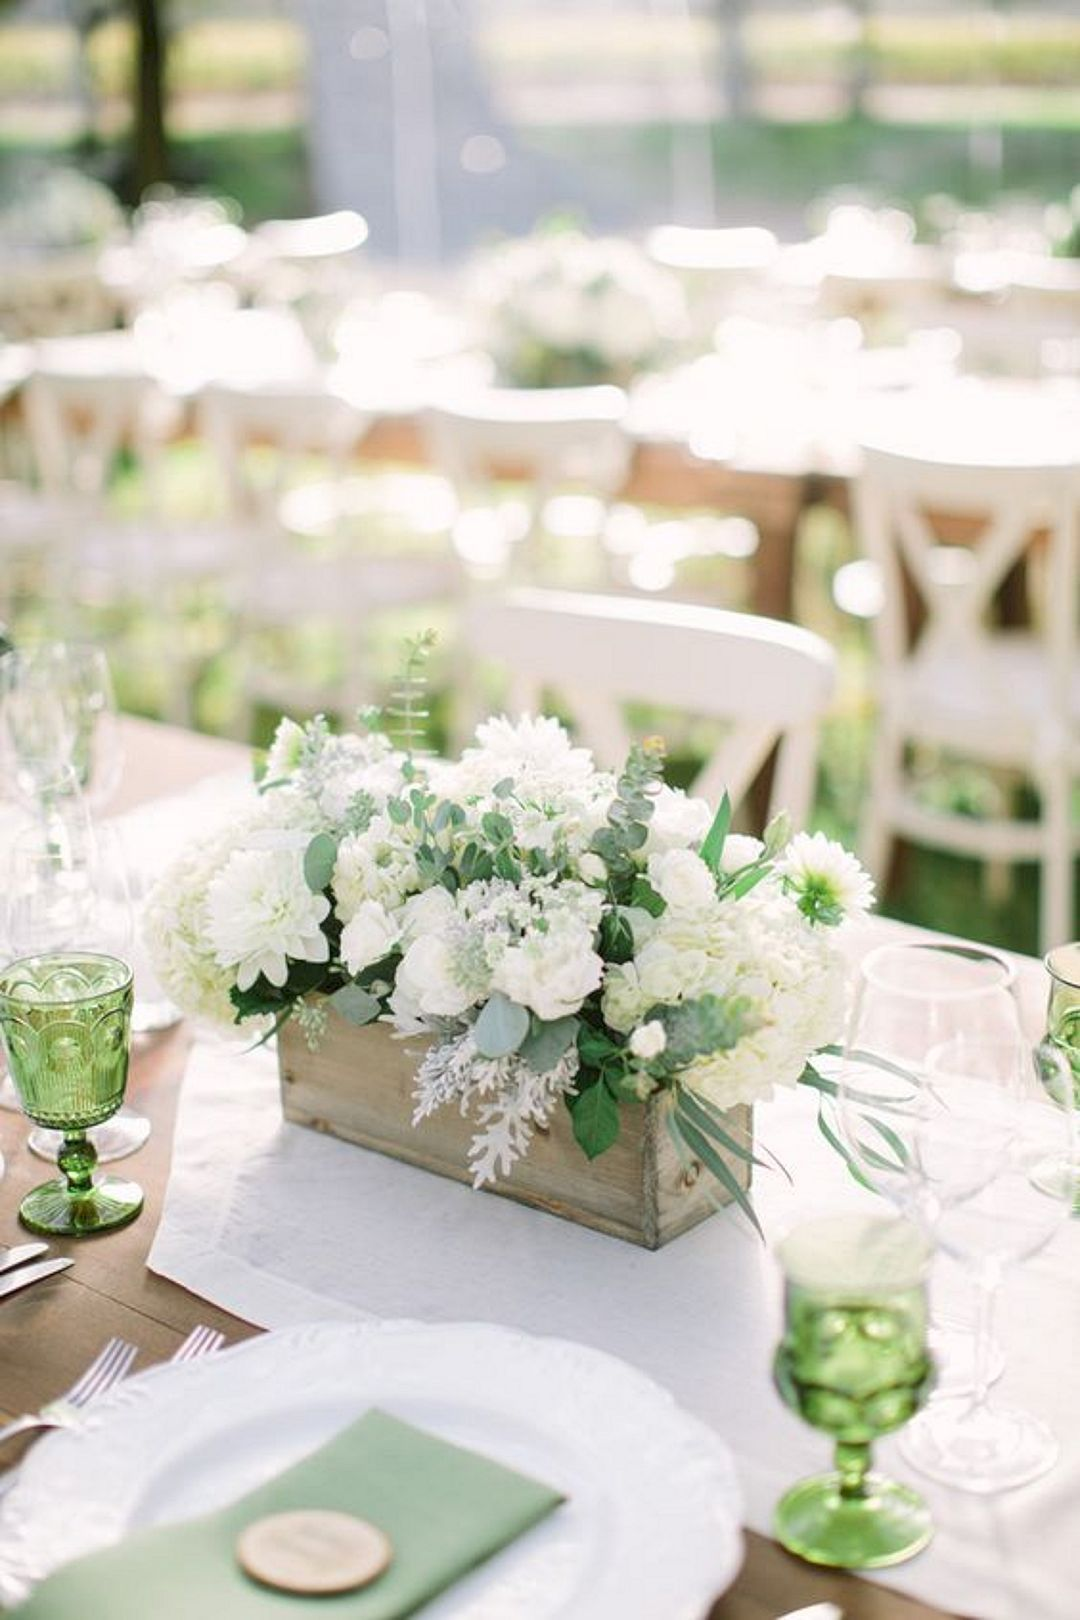 36 DIY Creative Rustic Chic Wedding Centerpieces Ideas | Pinterest ...